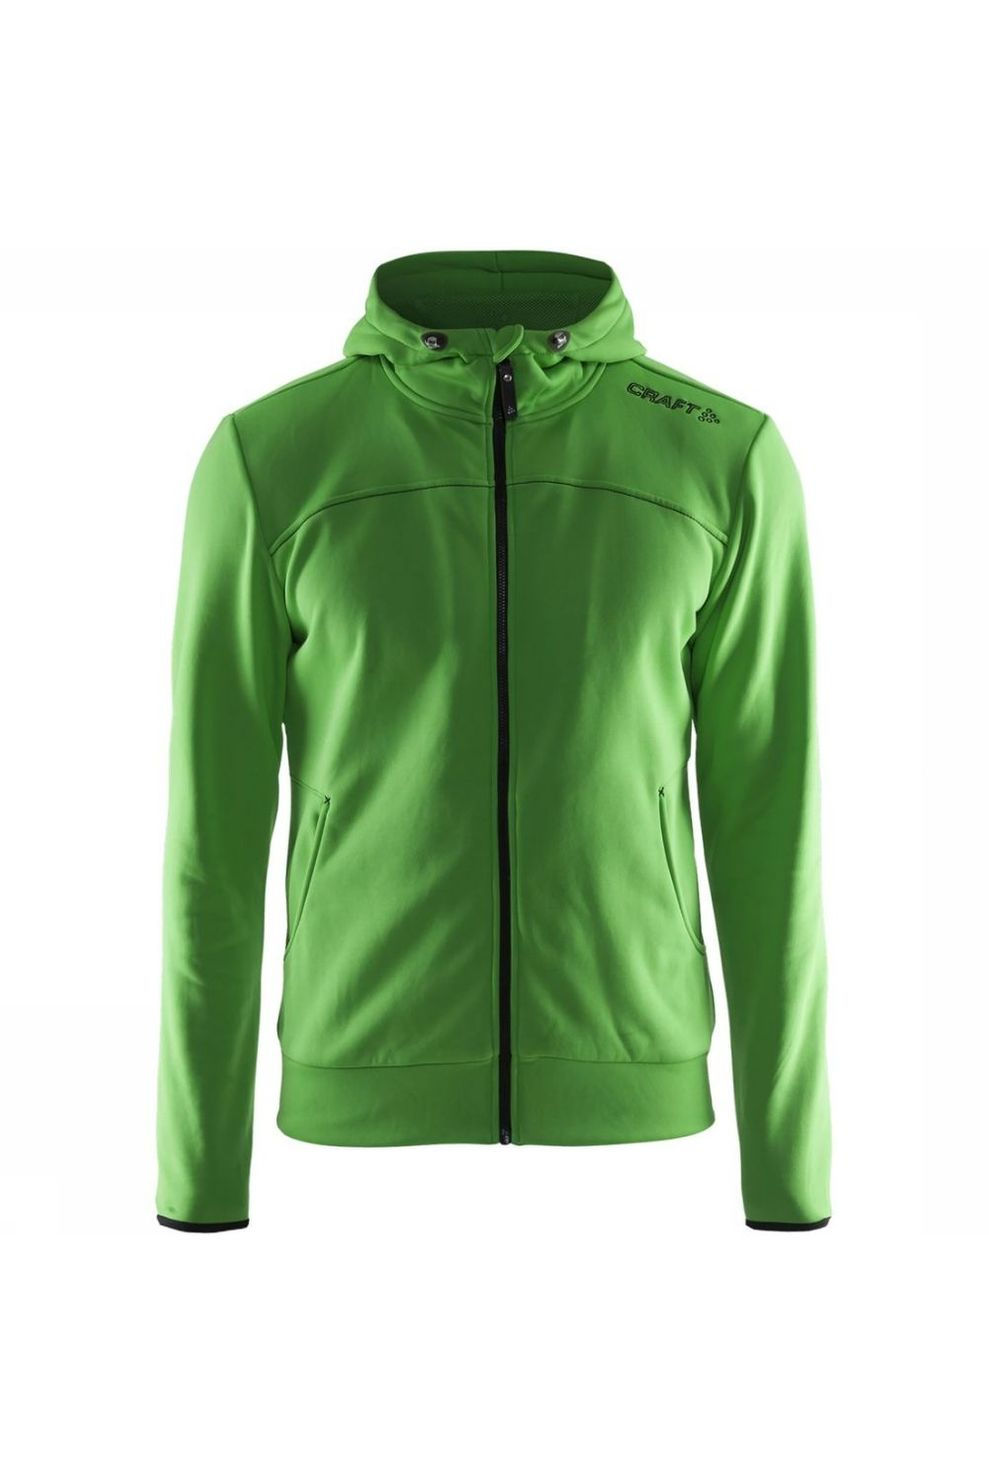 Craft Fleece Leisure F.Z Hood voor heren - Groen - Maten: XS, S, M, L, XL, XXL, XXXL, XXXXL